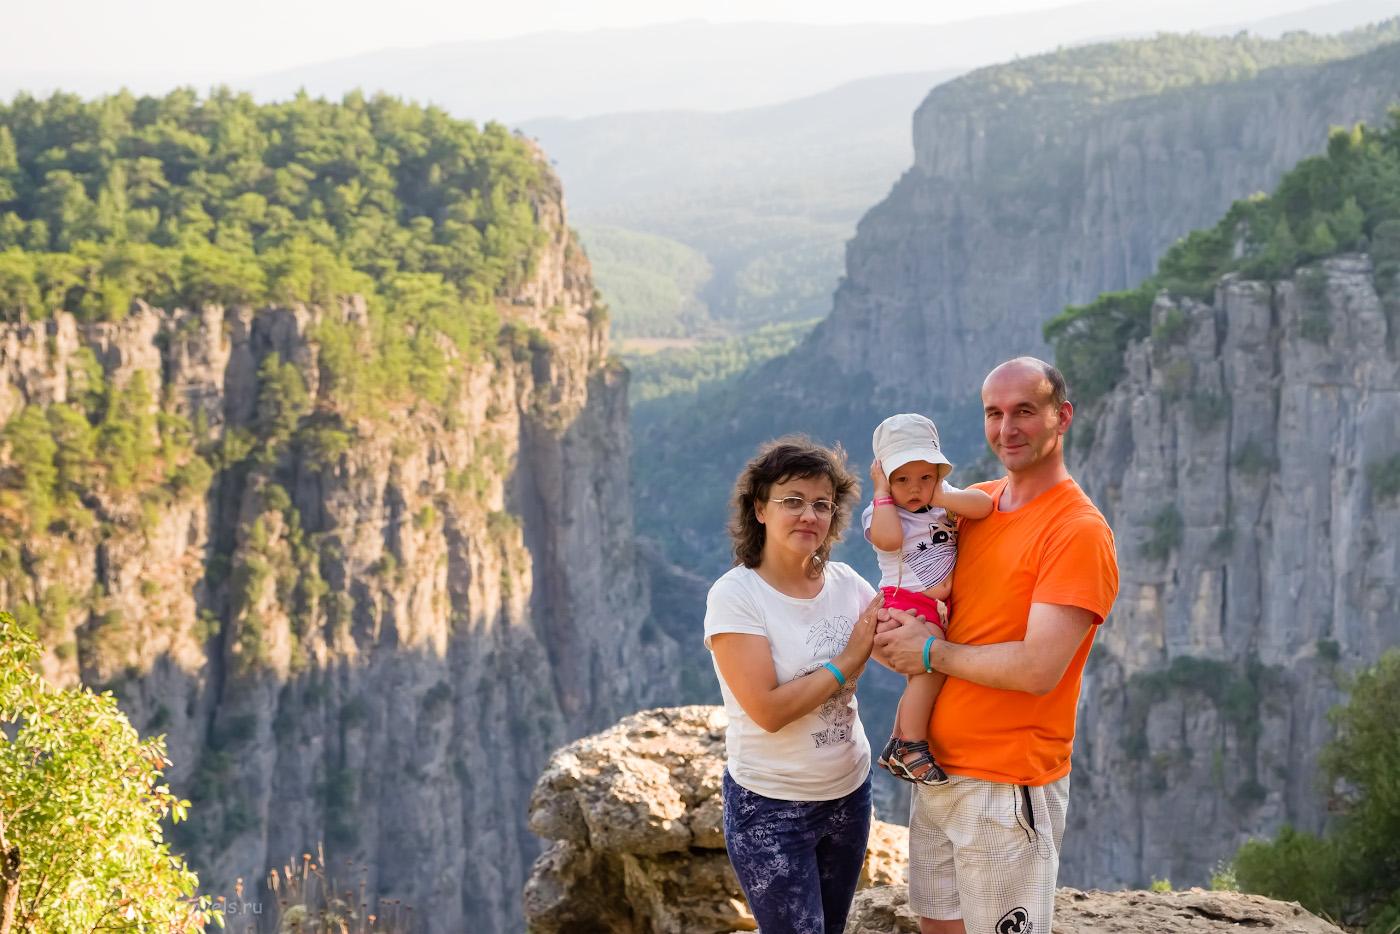 16. Семейный портрет на фоне каньона Тазы (Tazi Canyon), снятый на Fujifilm X-T10 с объективом Fujinon 16-55mm f/2.8. Настройки: 1/320, 4.0, 200, 38.